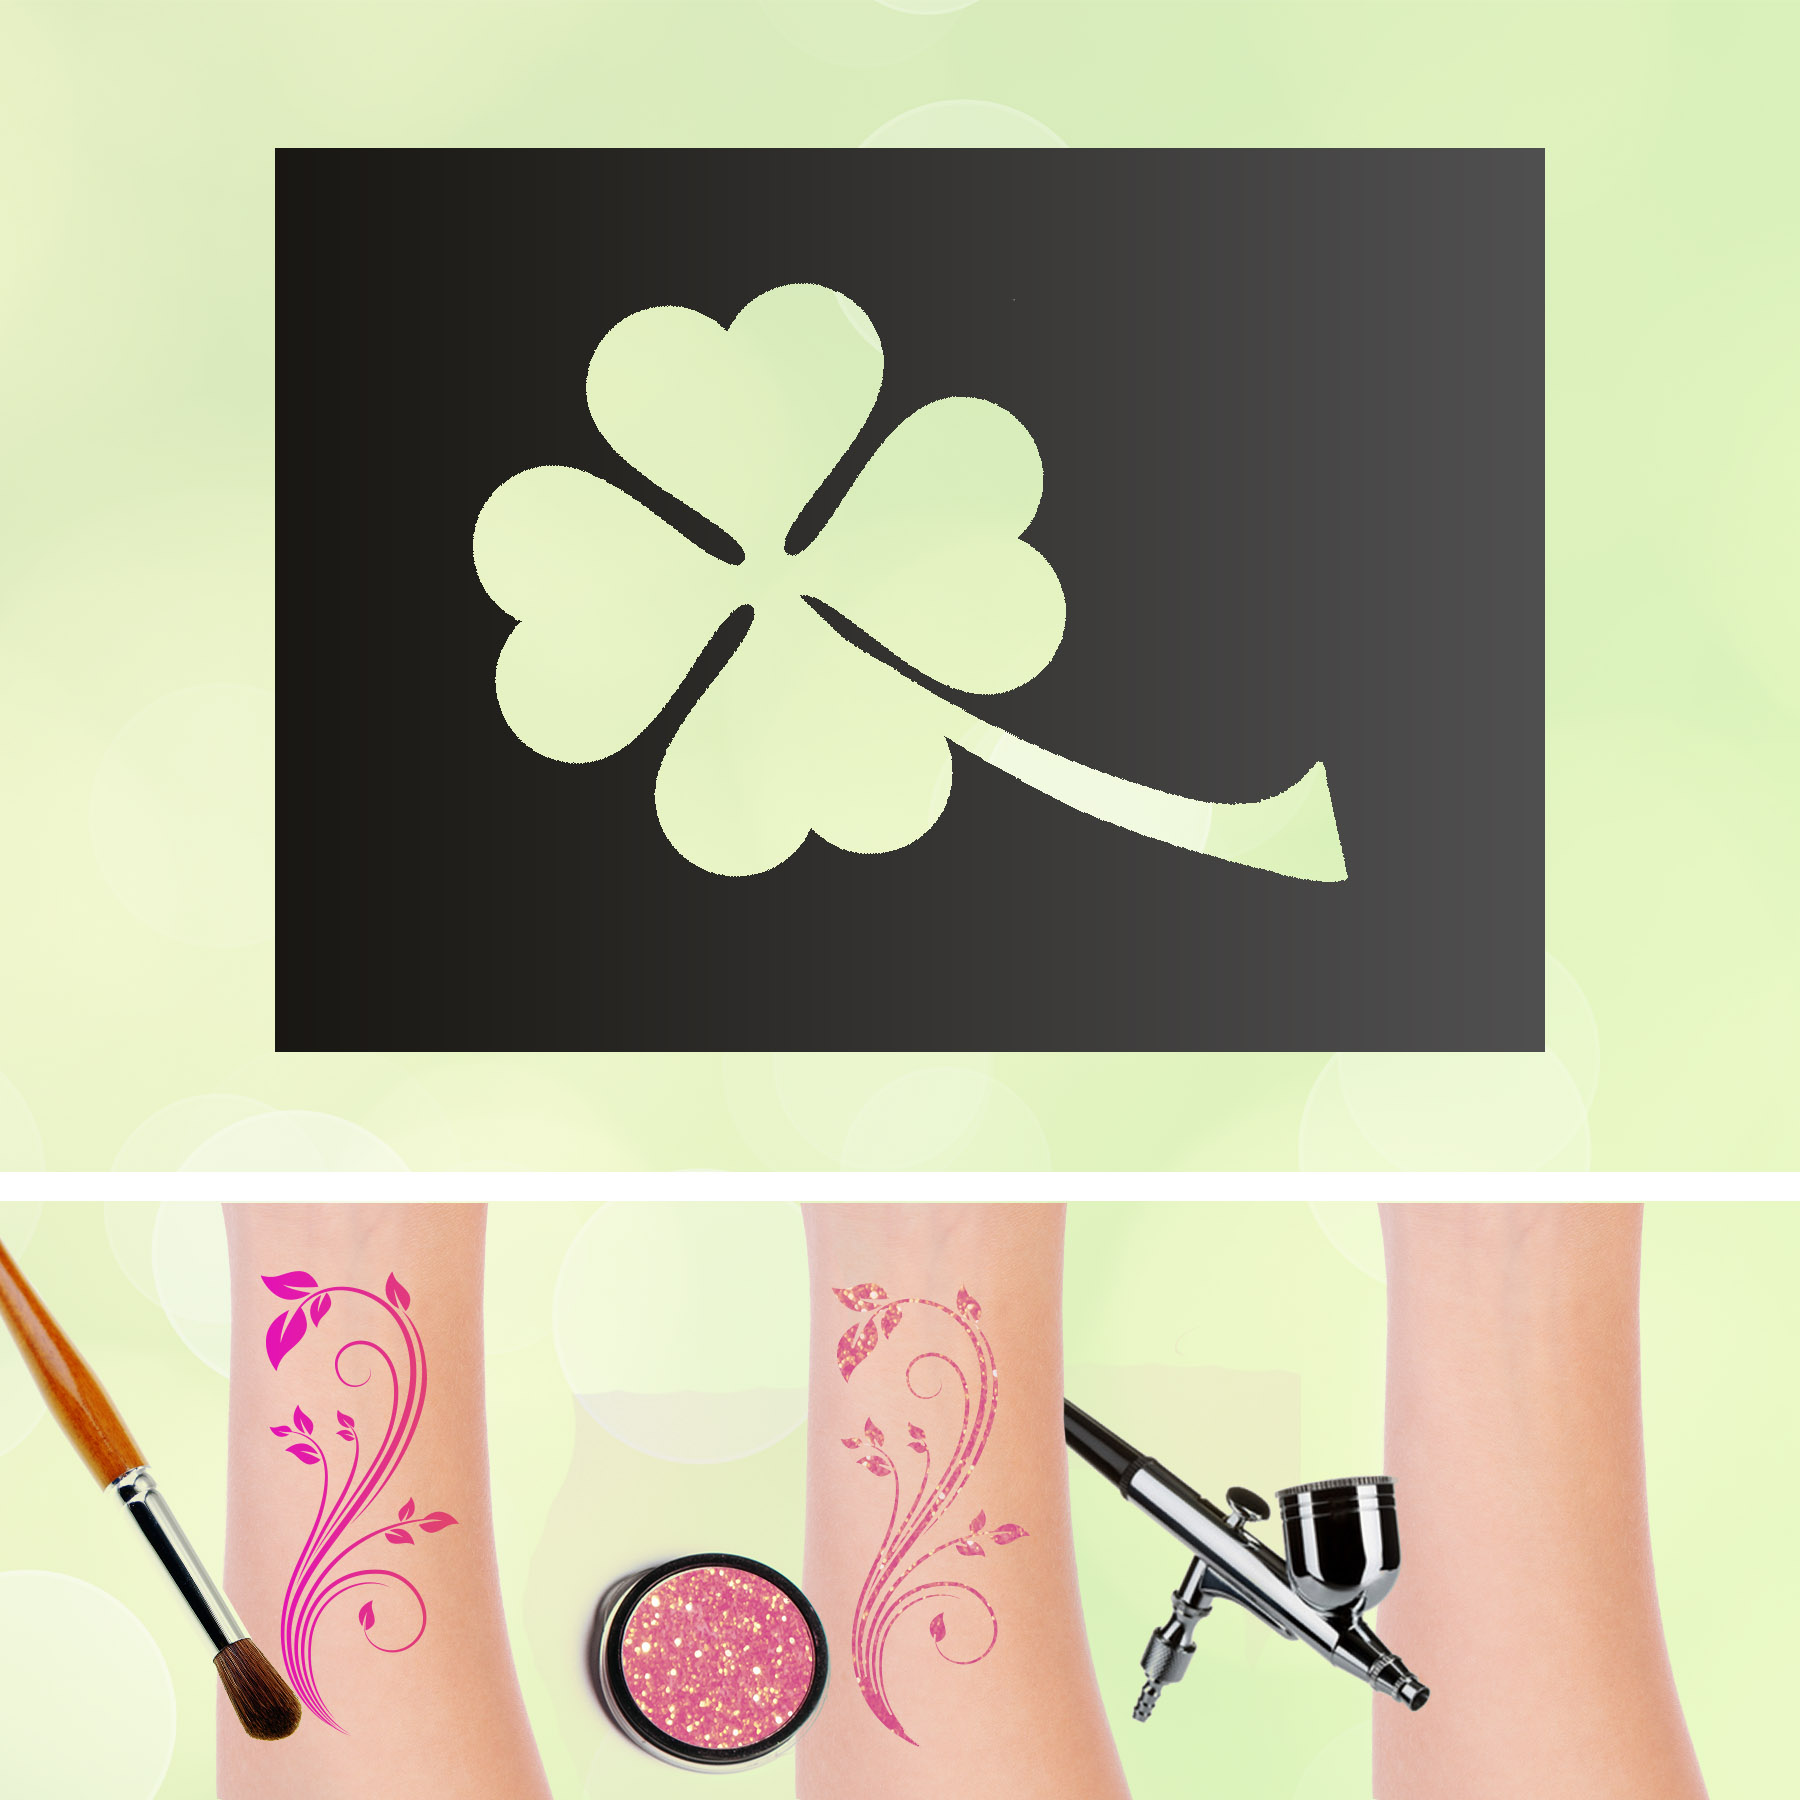 Tattoo Schablonen Kleeblatt Selbstklebend Kinderschminken Airbrush